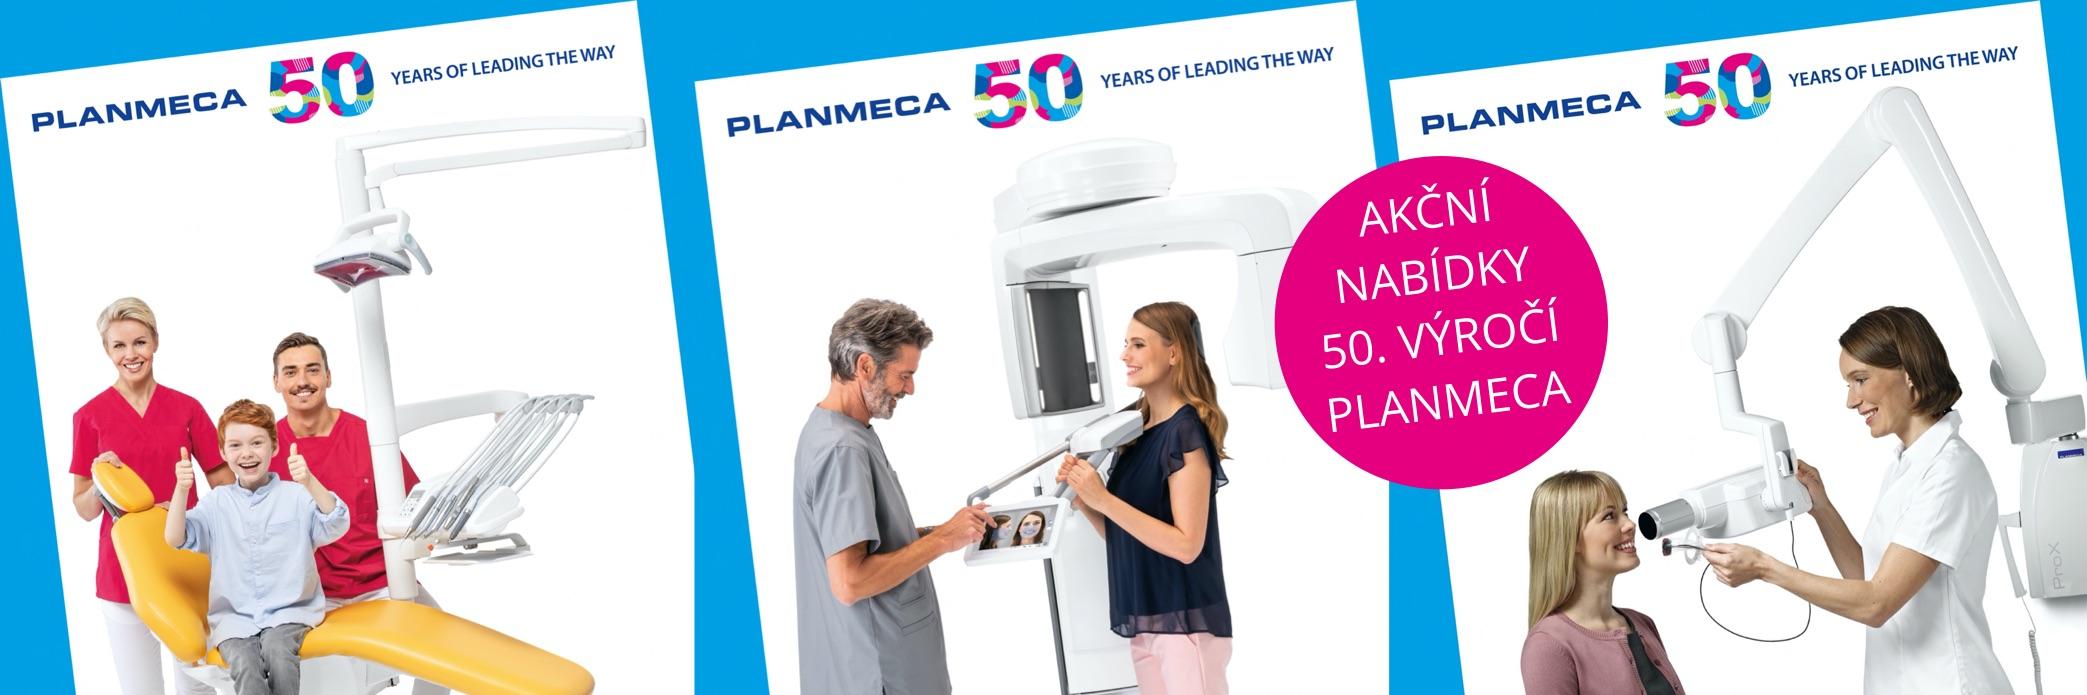 Planmeca50